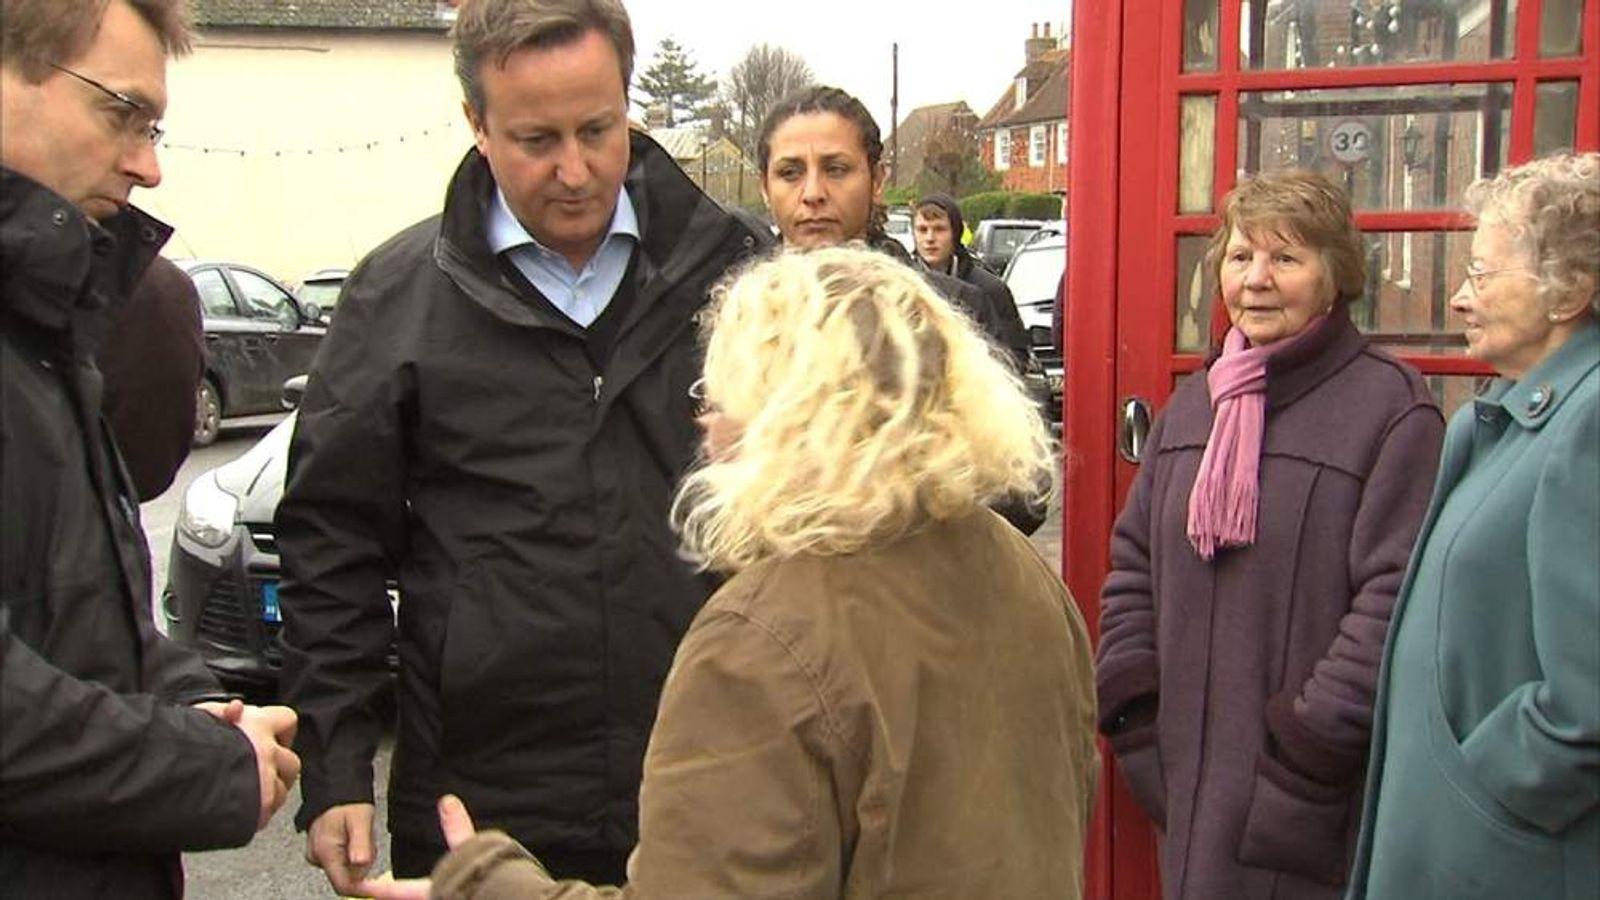 David Cameron and Erica Olivares